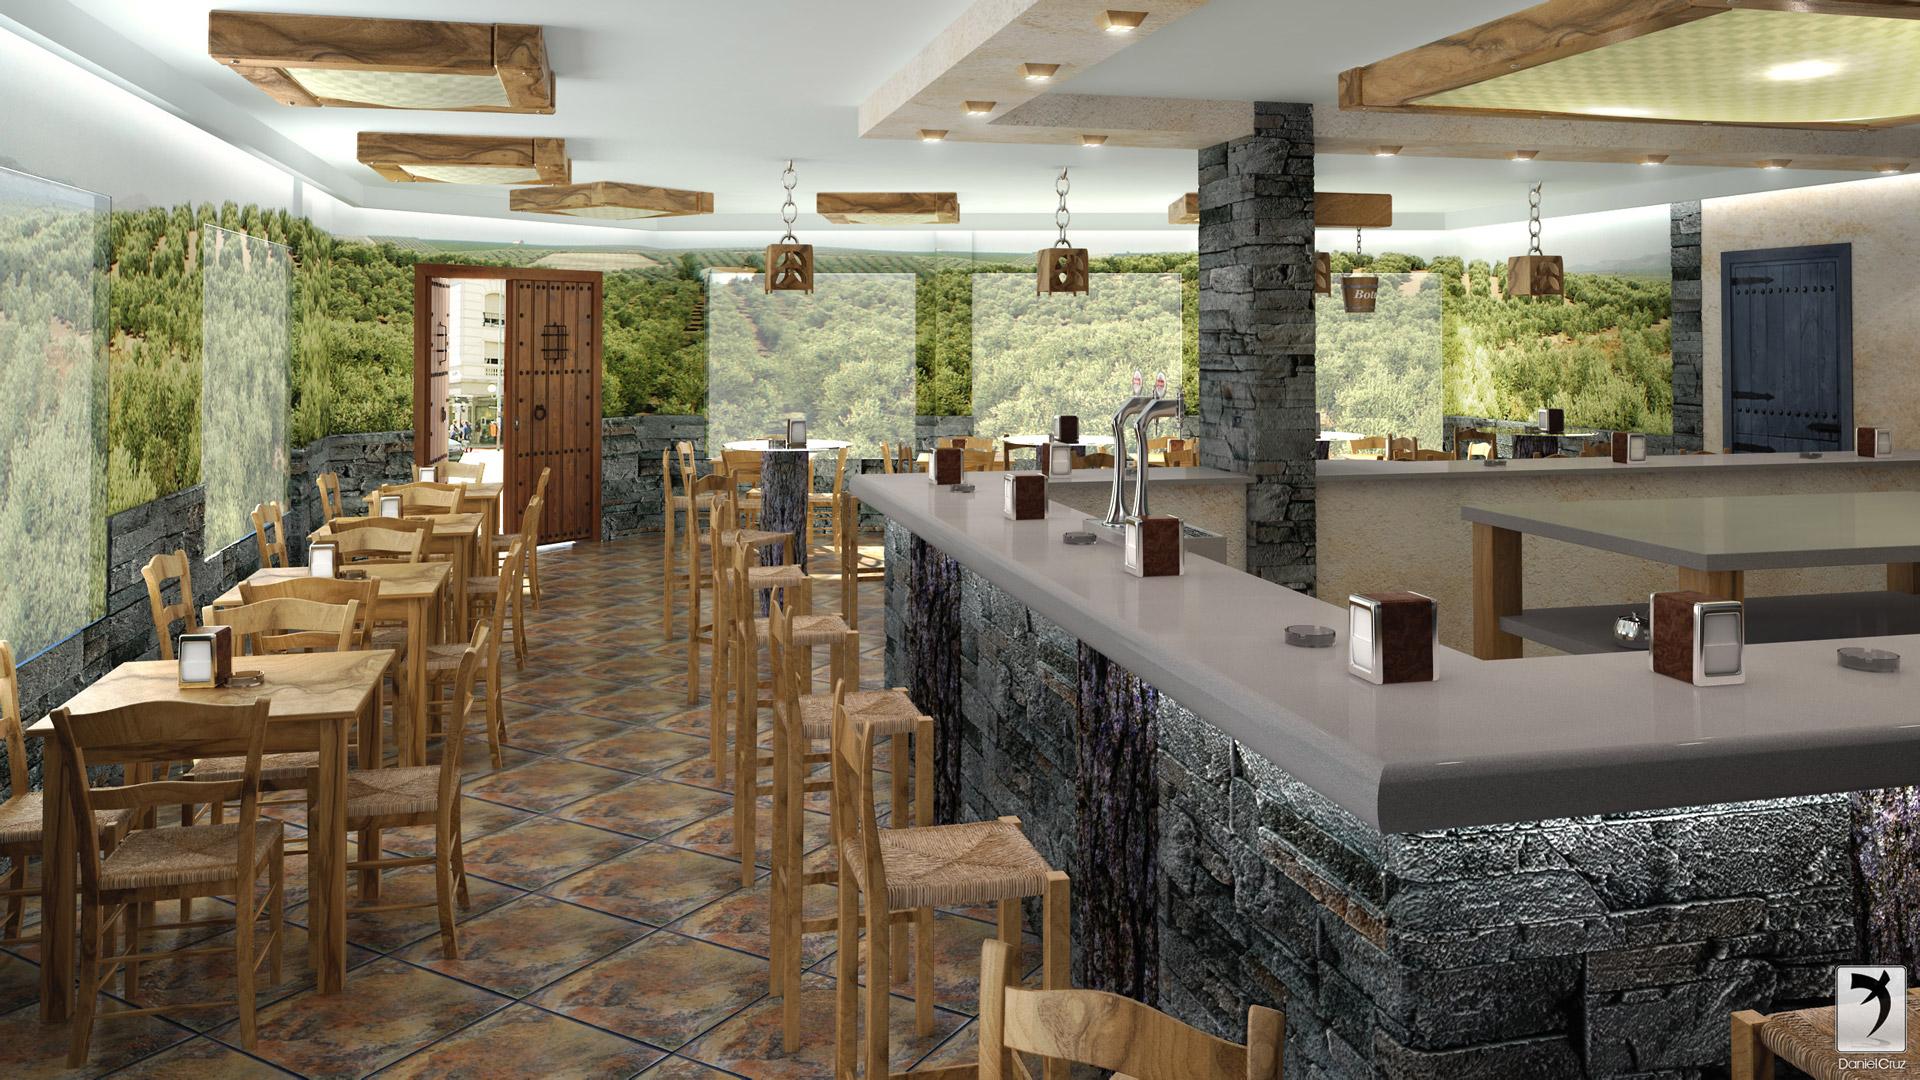 decoracion de interiores bares rusticos:Bar-Restaurante rustico-bar-alcala-vista-1-final.jpg